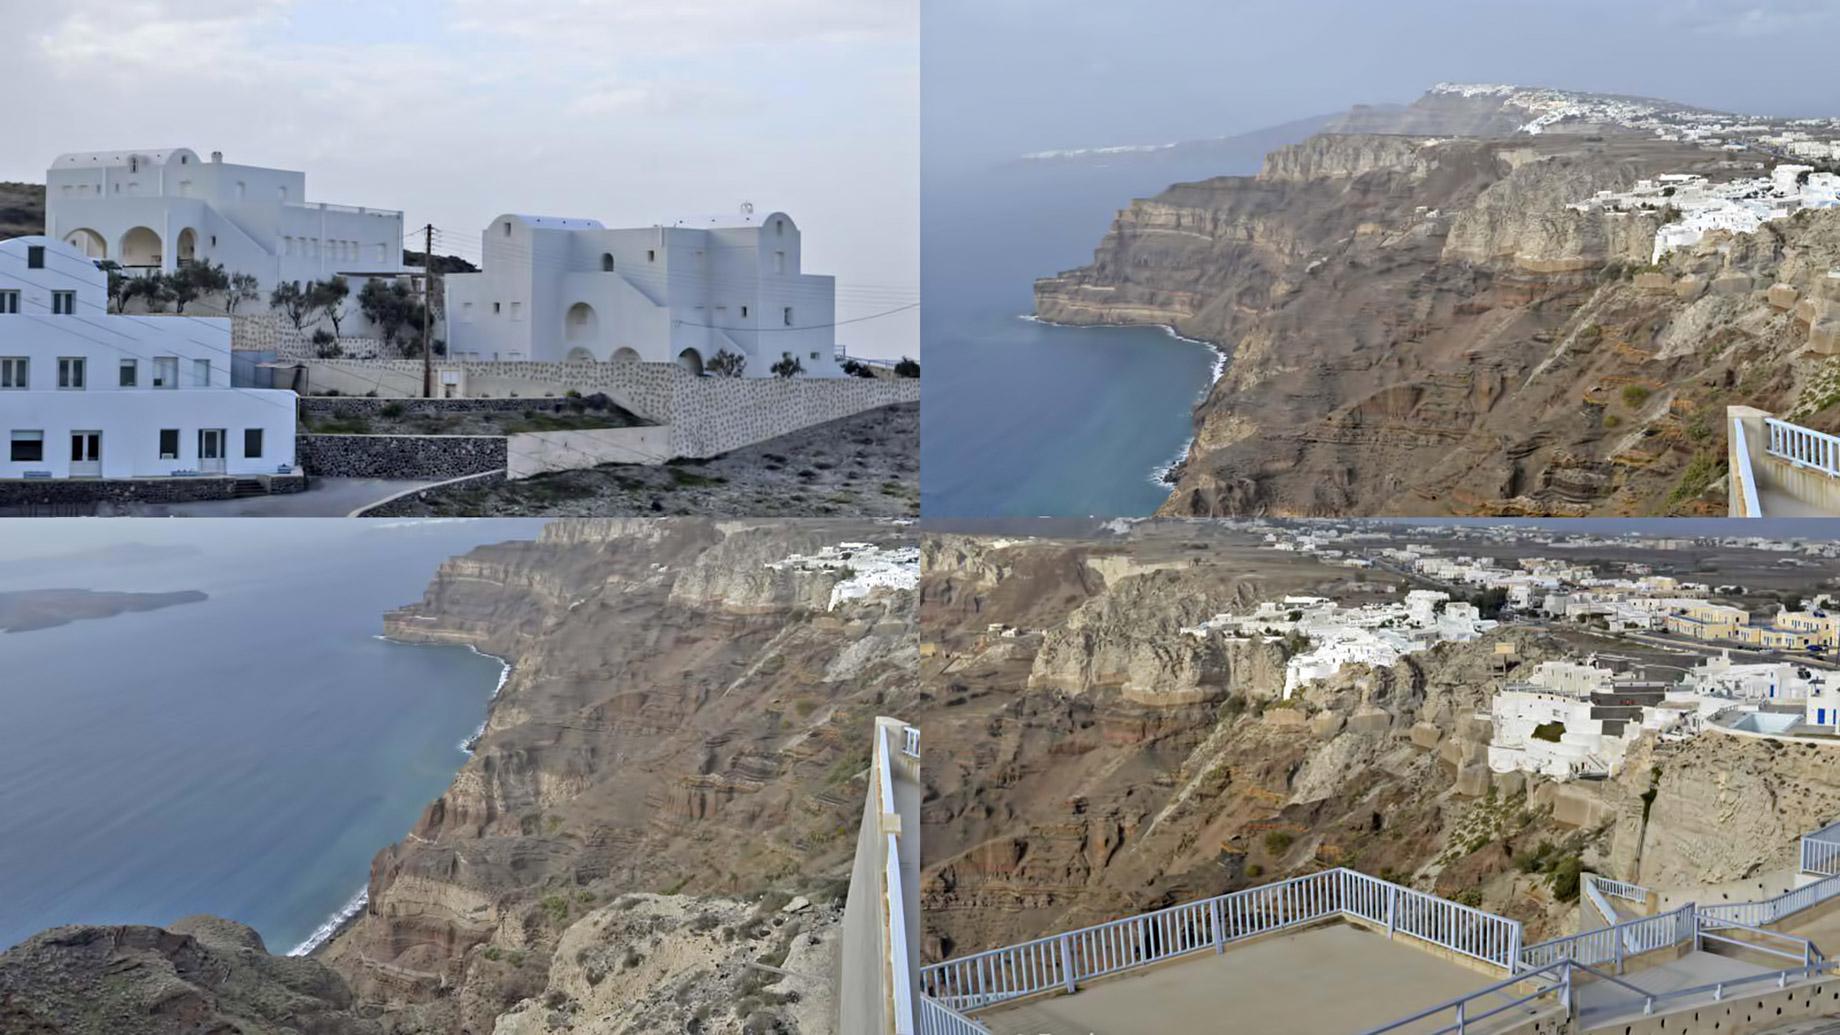 Santorini Greece Real Estate - The Aegean Island Property Market